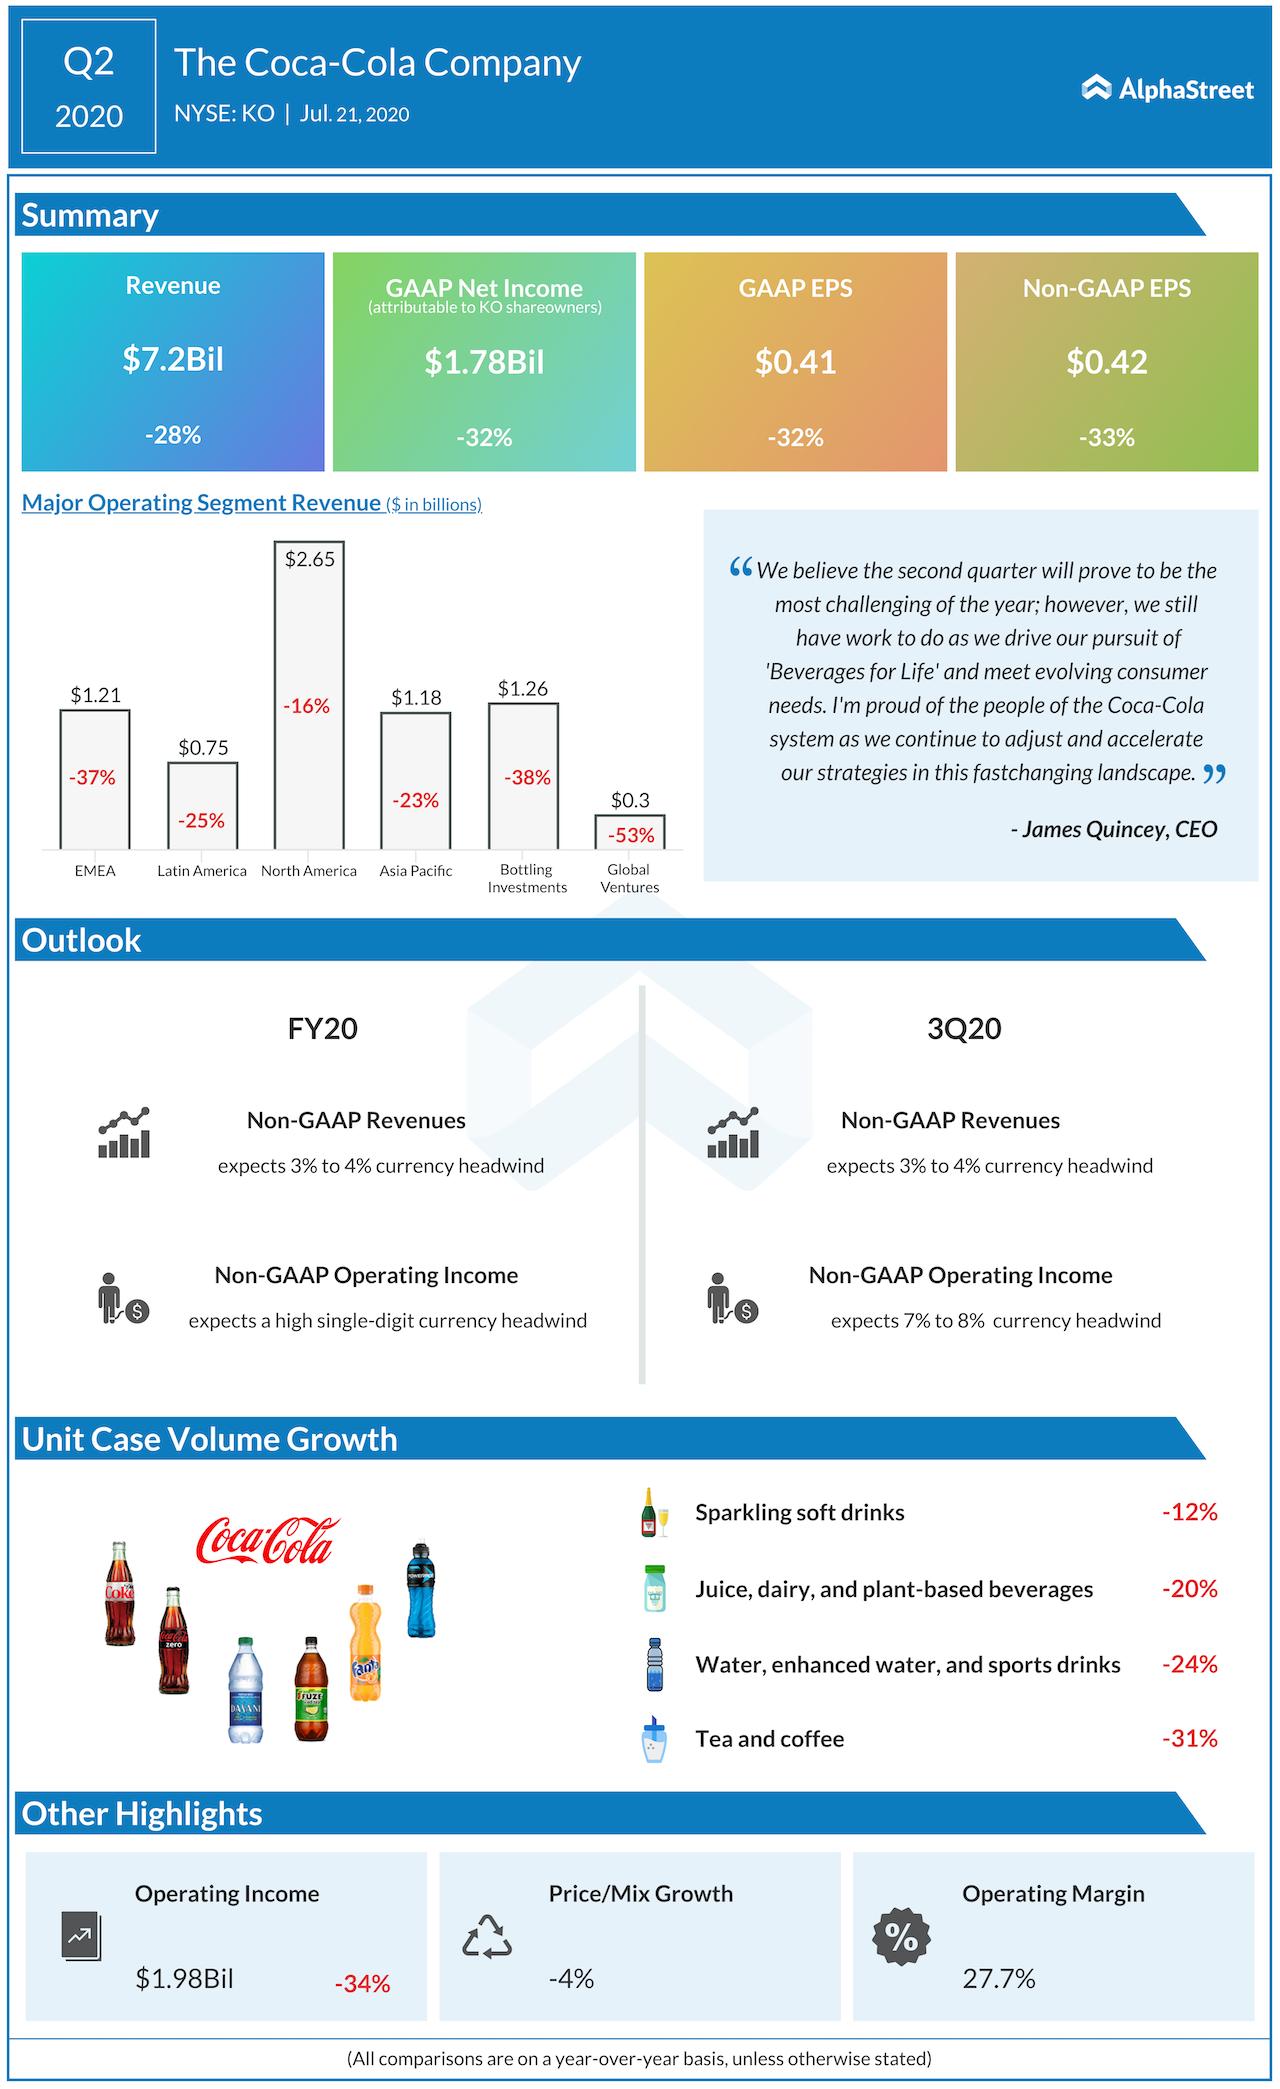 The-Coca-Cola-company-Q2-2020-earnings